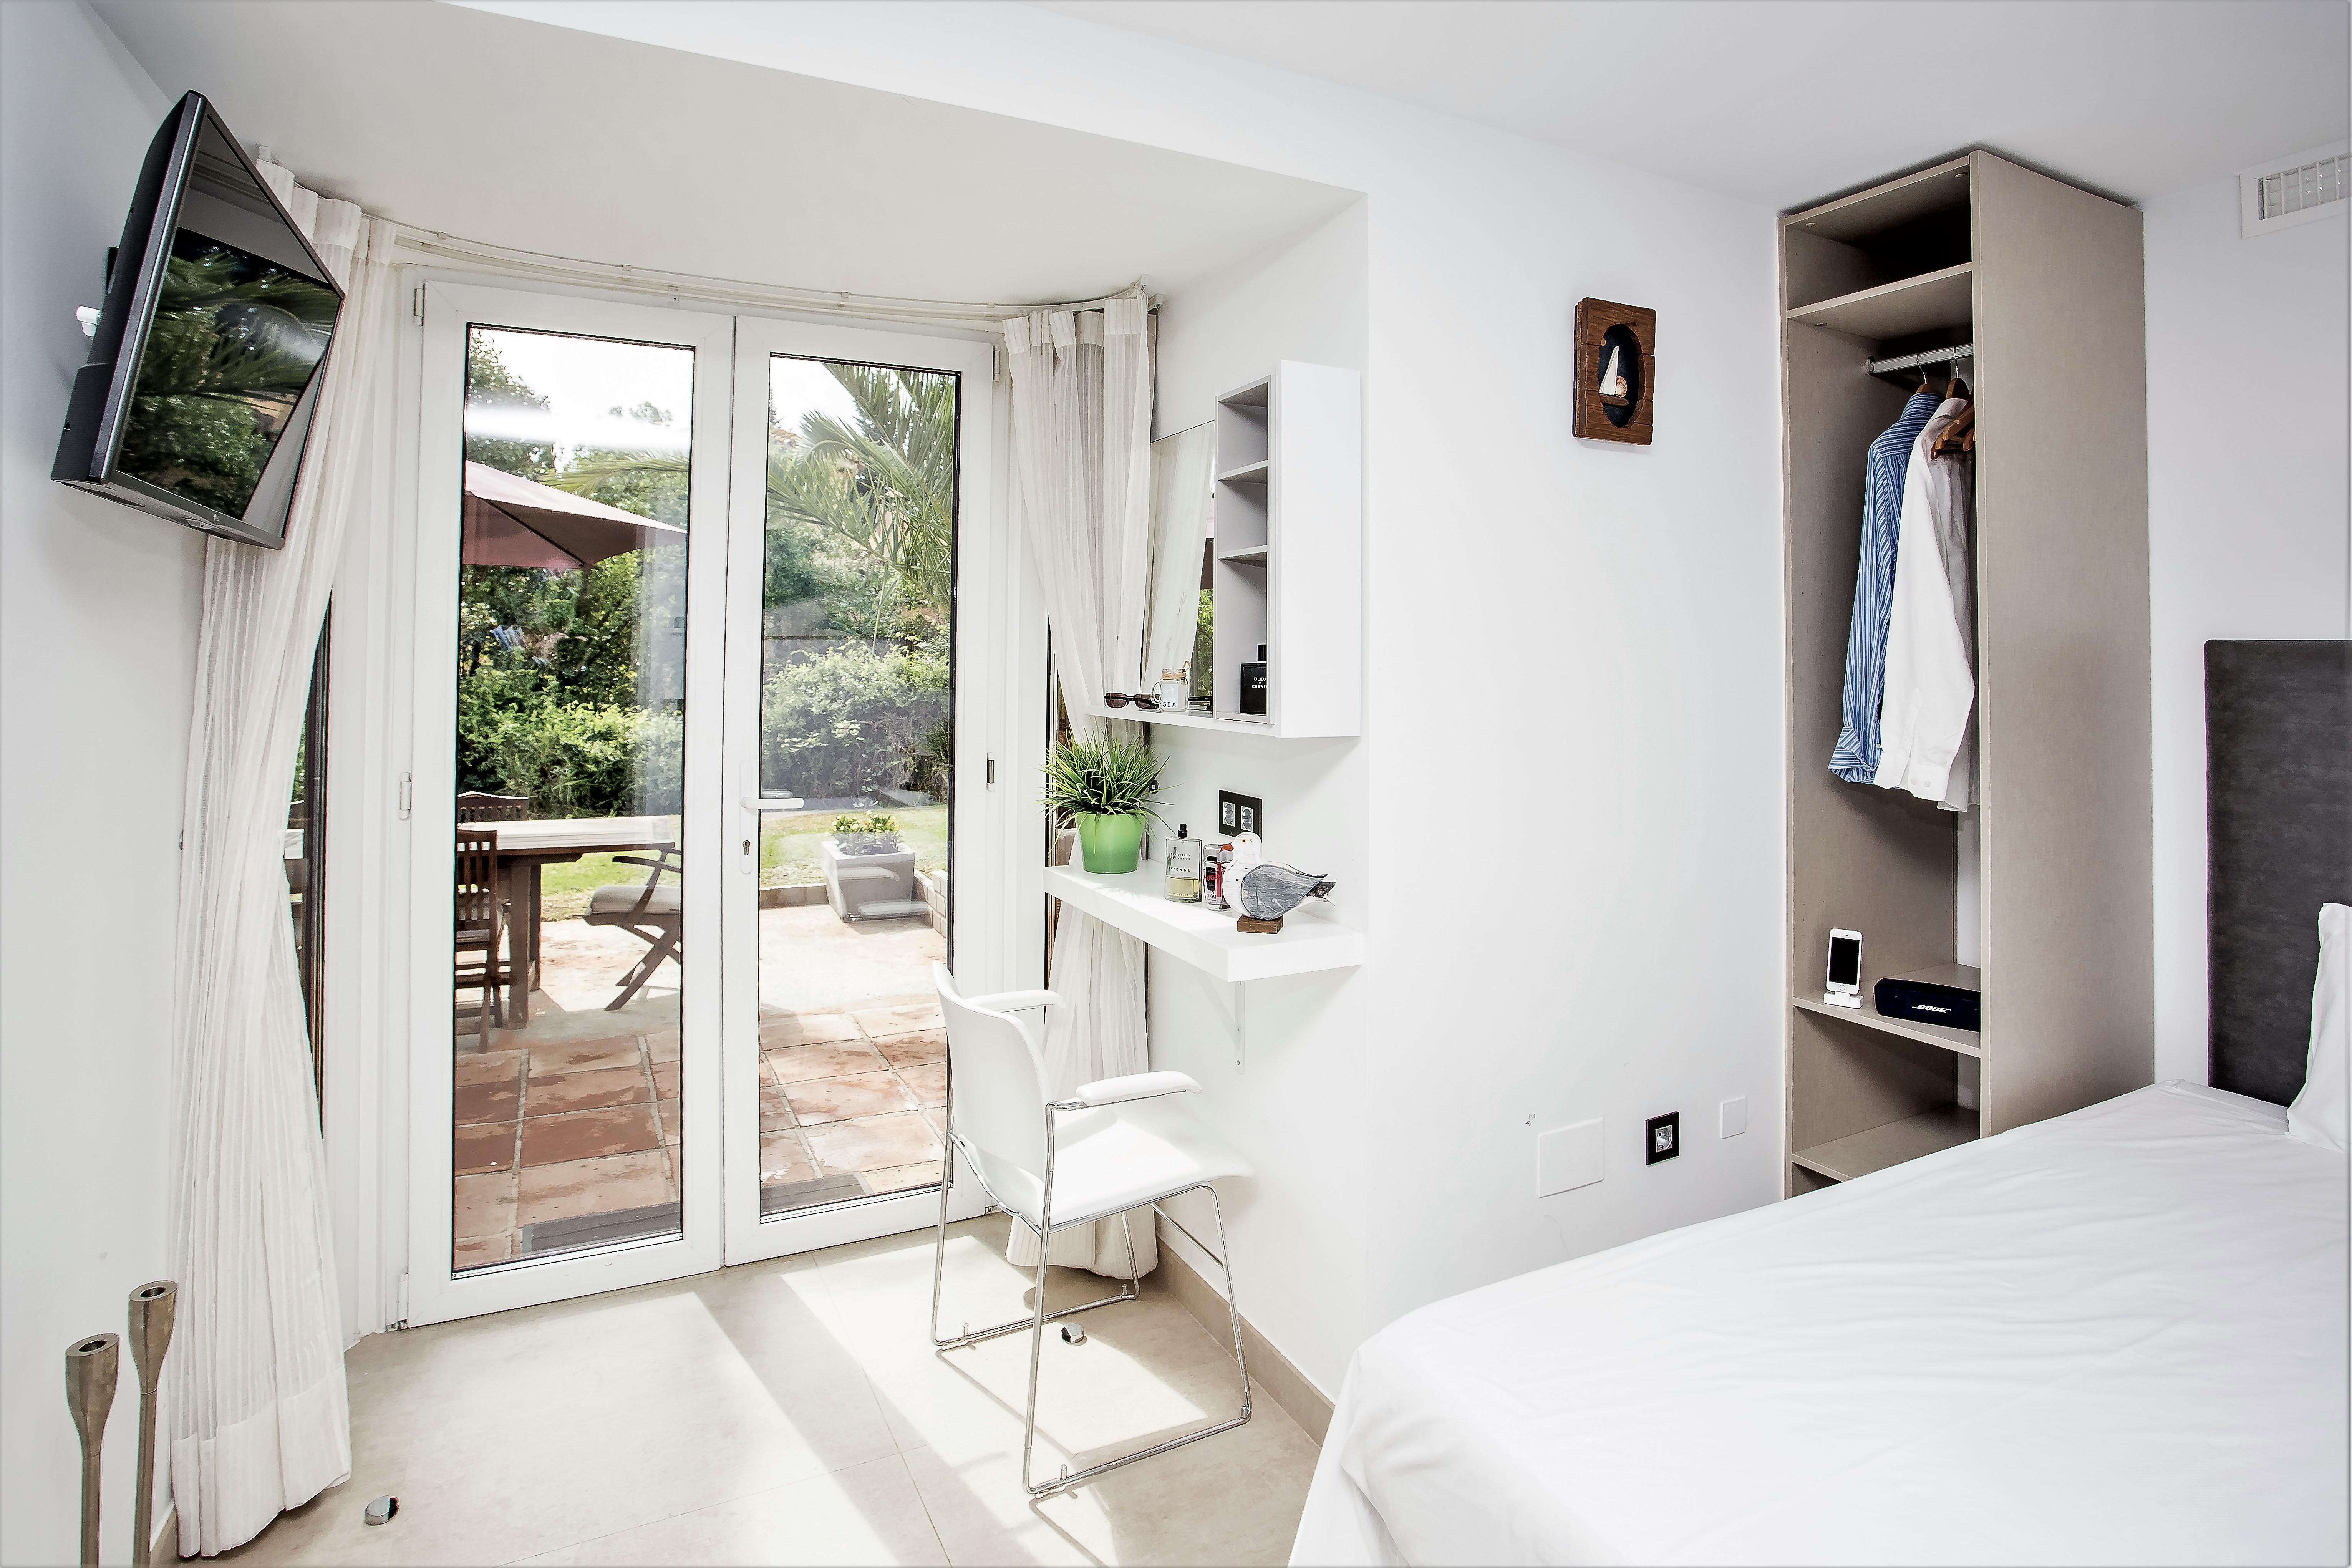 Apartment 8 Bedroom VILLA BY PUERTO BANUS   SEA 5 min                                photo 20066668